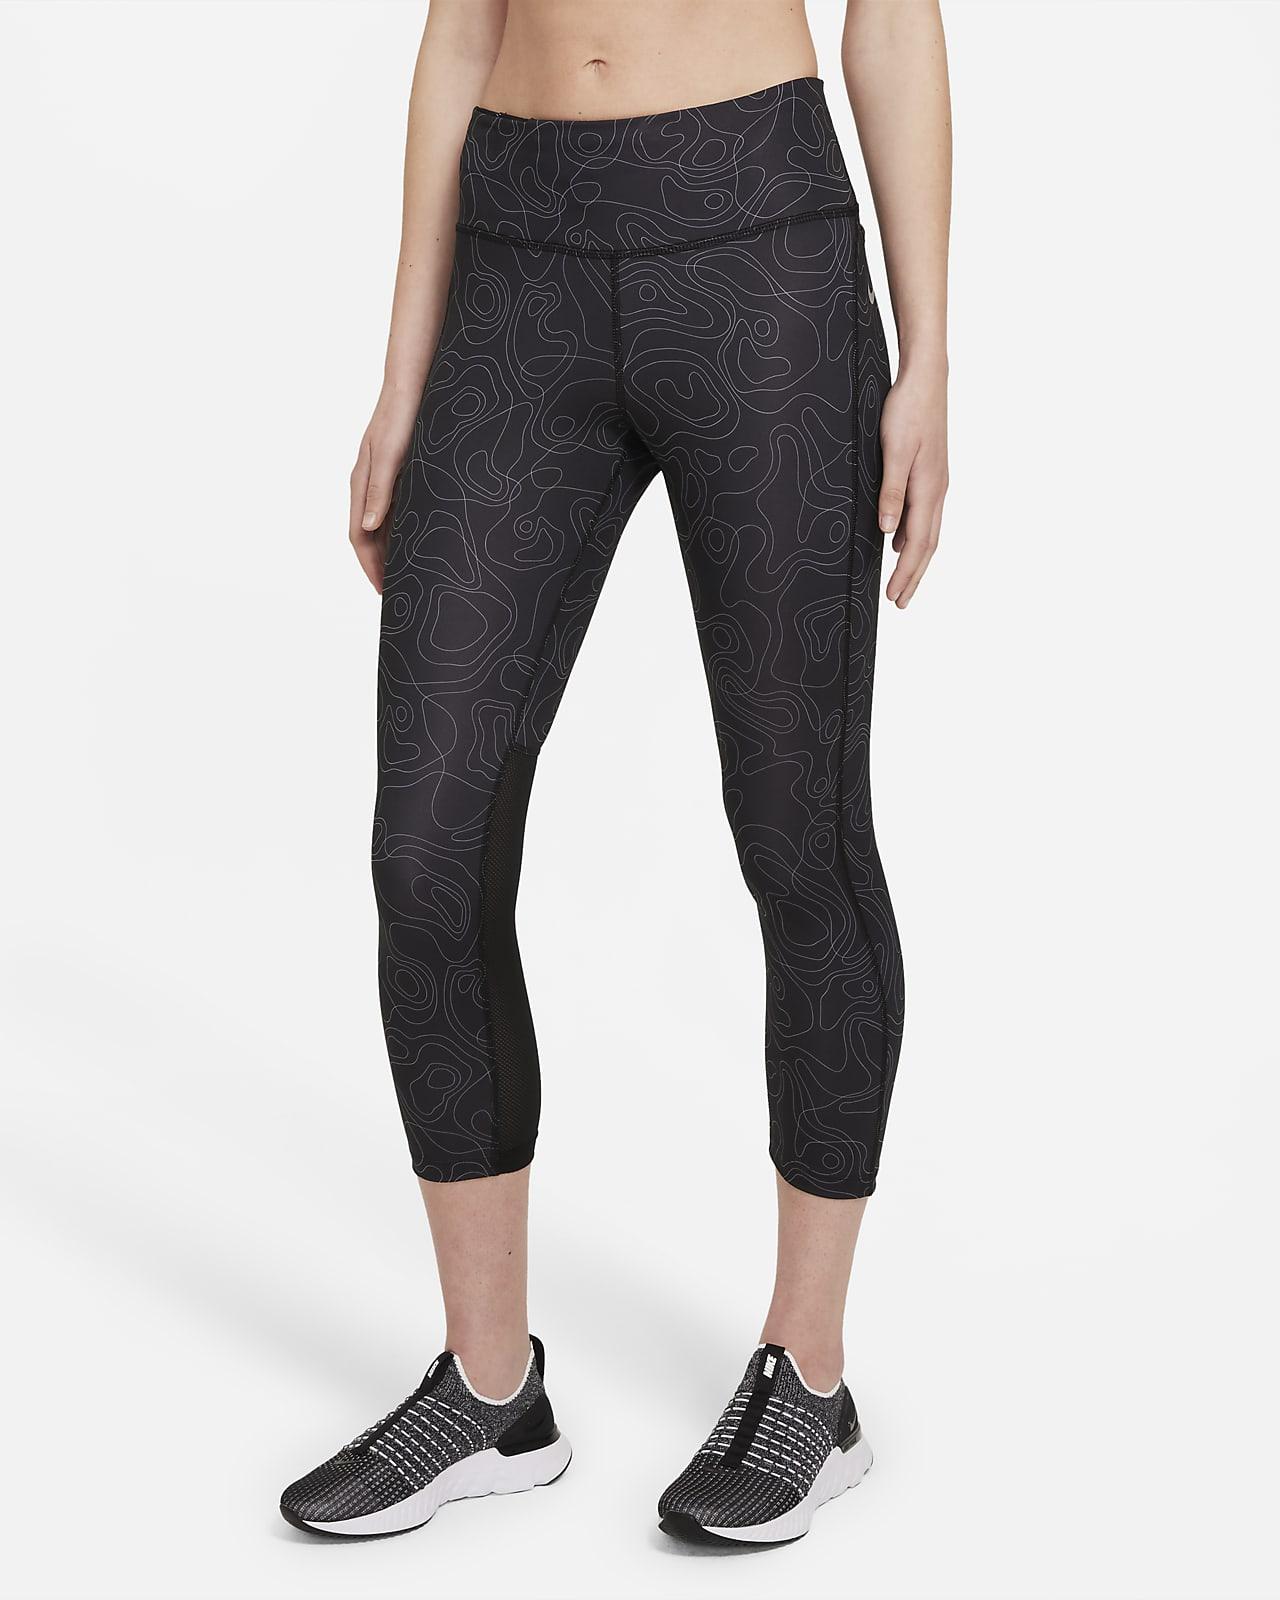 Legging de running court à taille mi-basse Nike Fast Run Division pour Femme